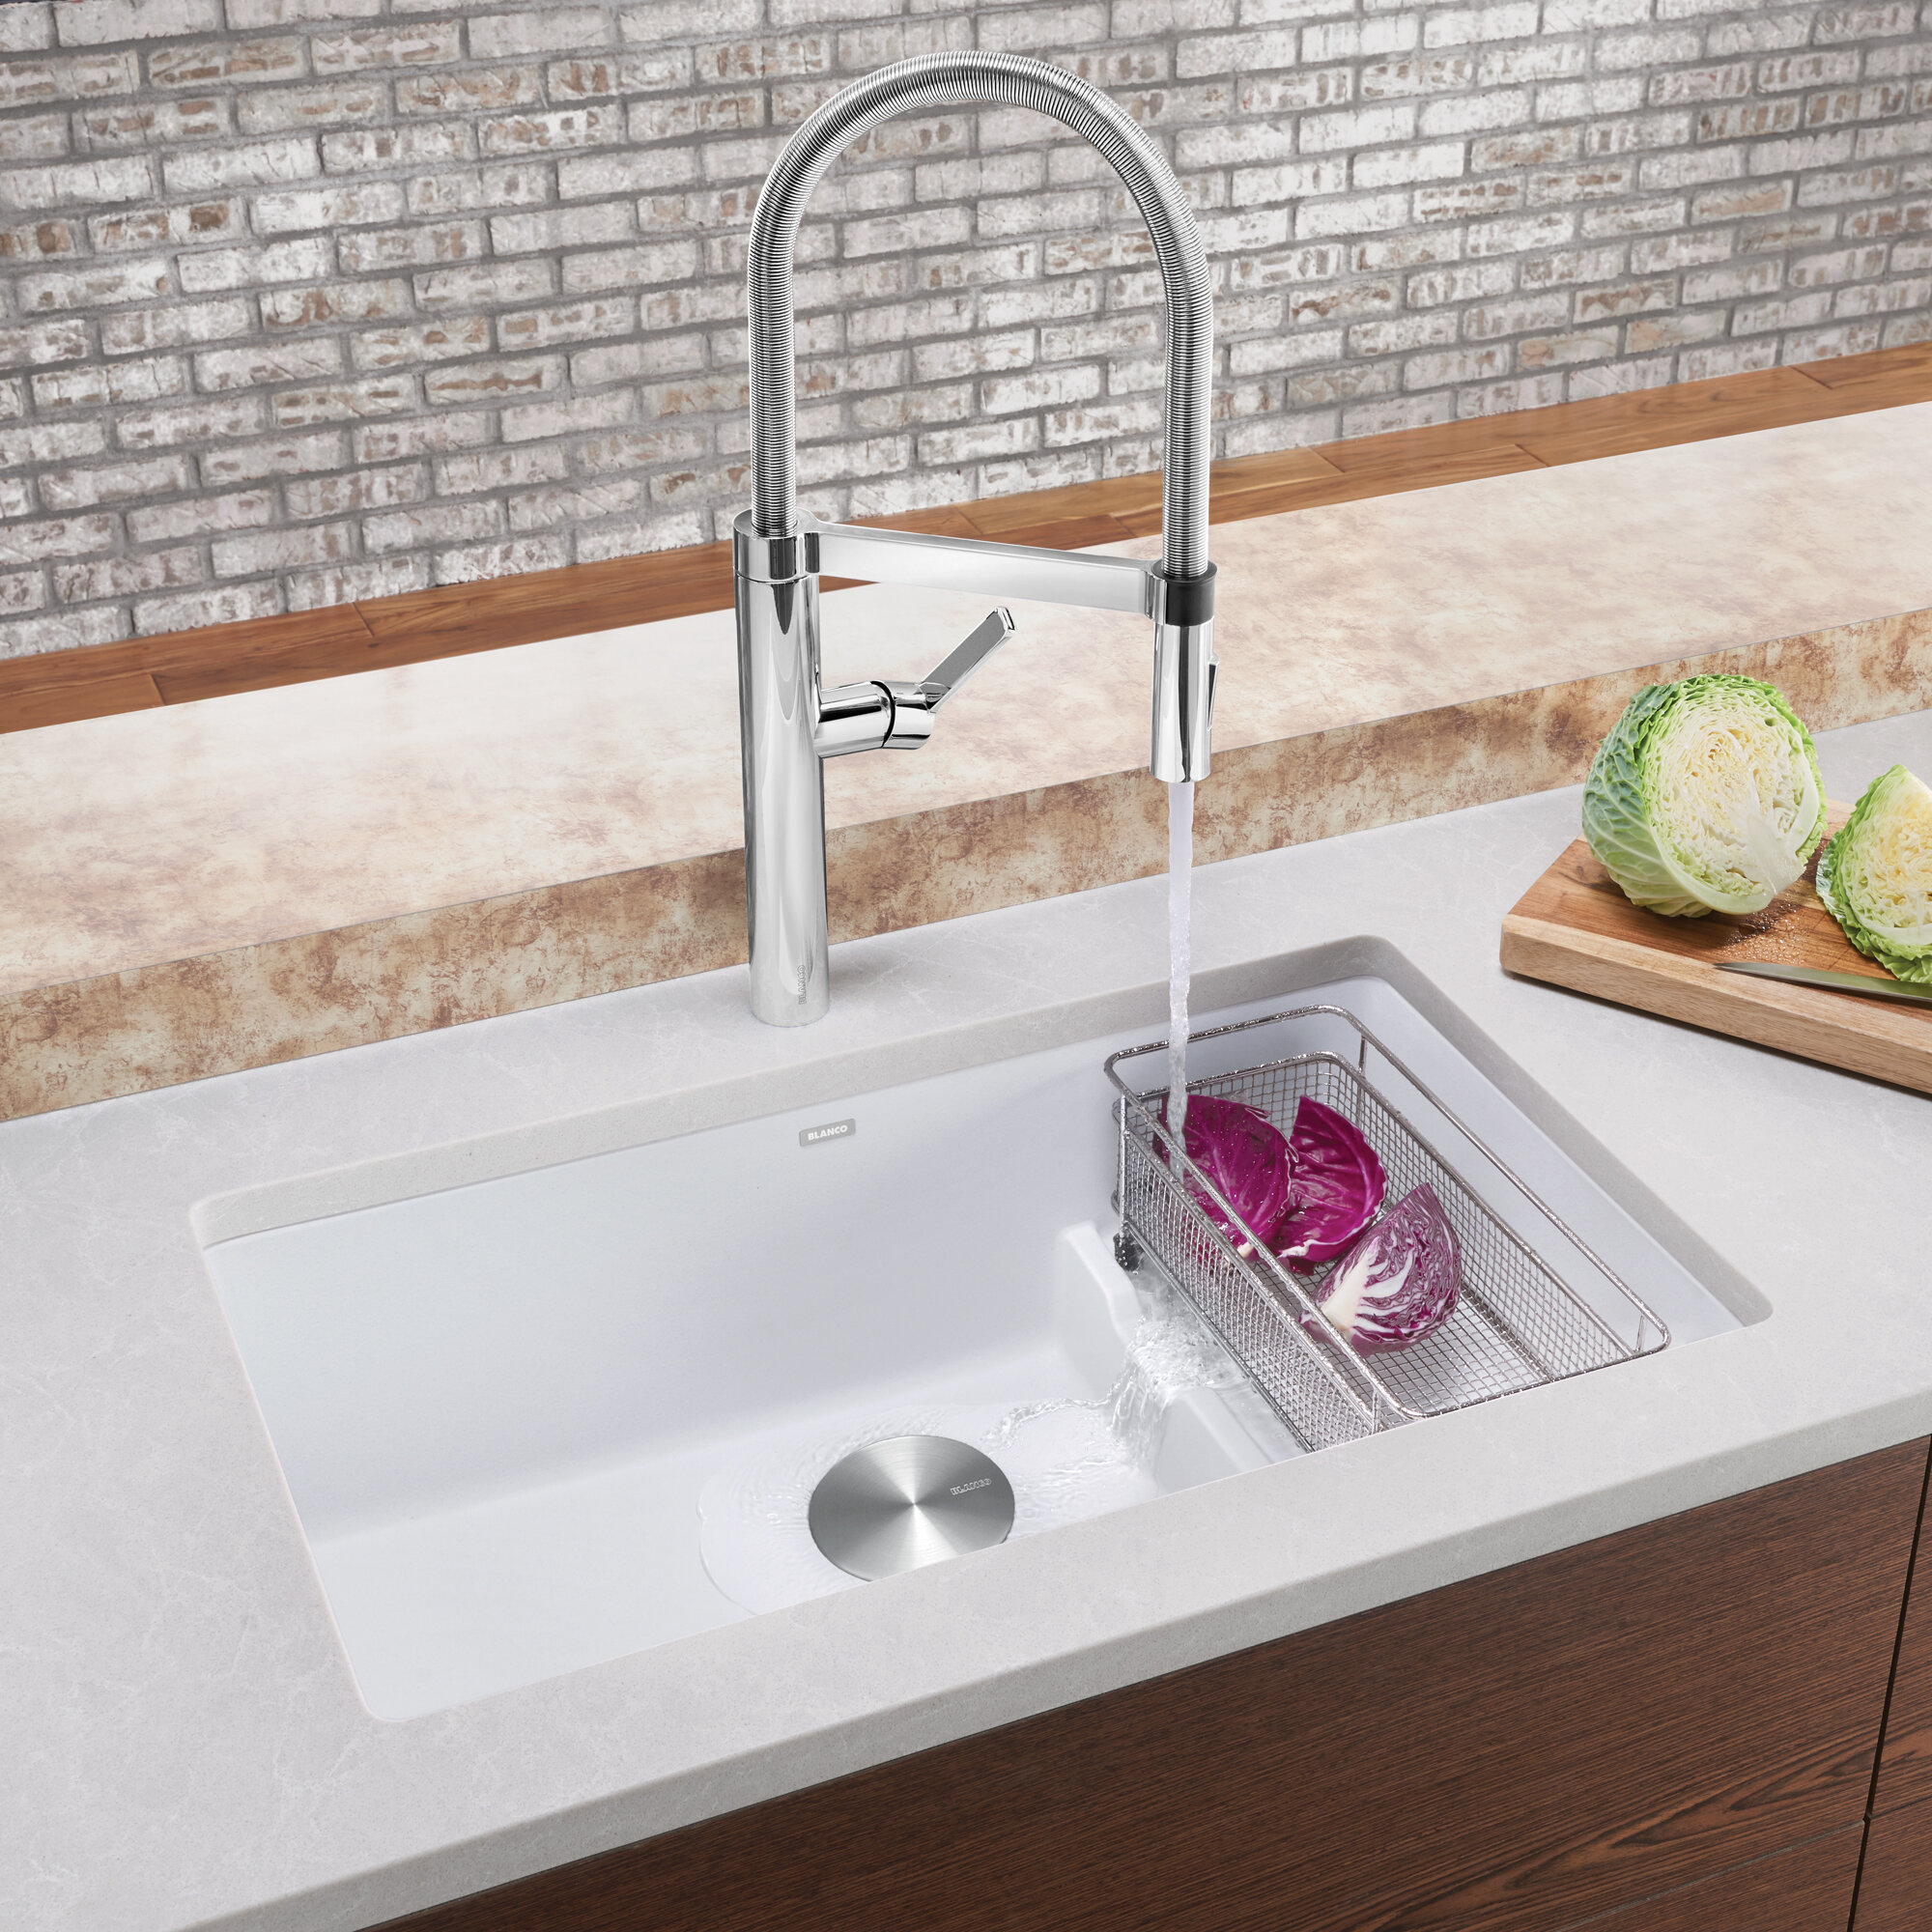 Blanco Precis 29 L X 18 W Undermount Kitchen Sink Reviews Wayfair